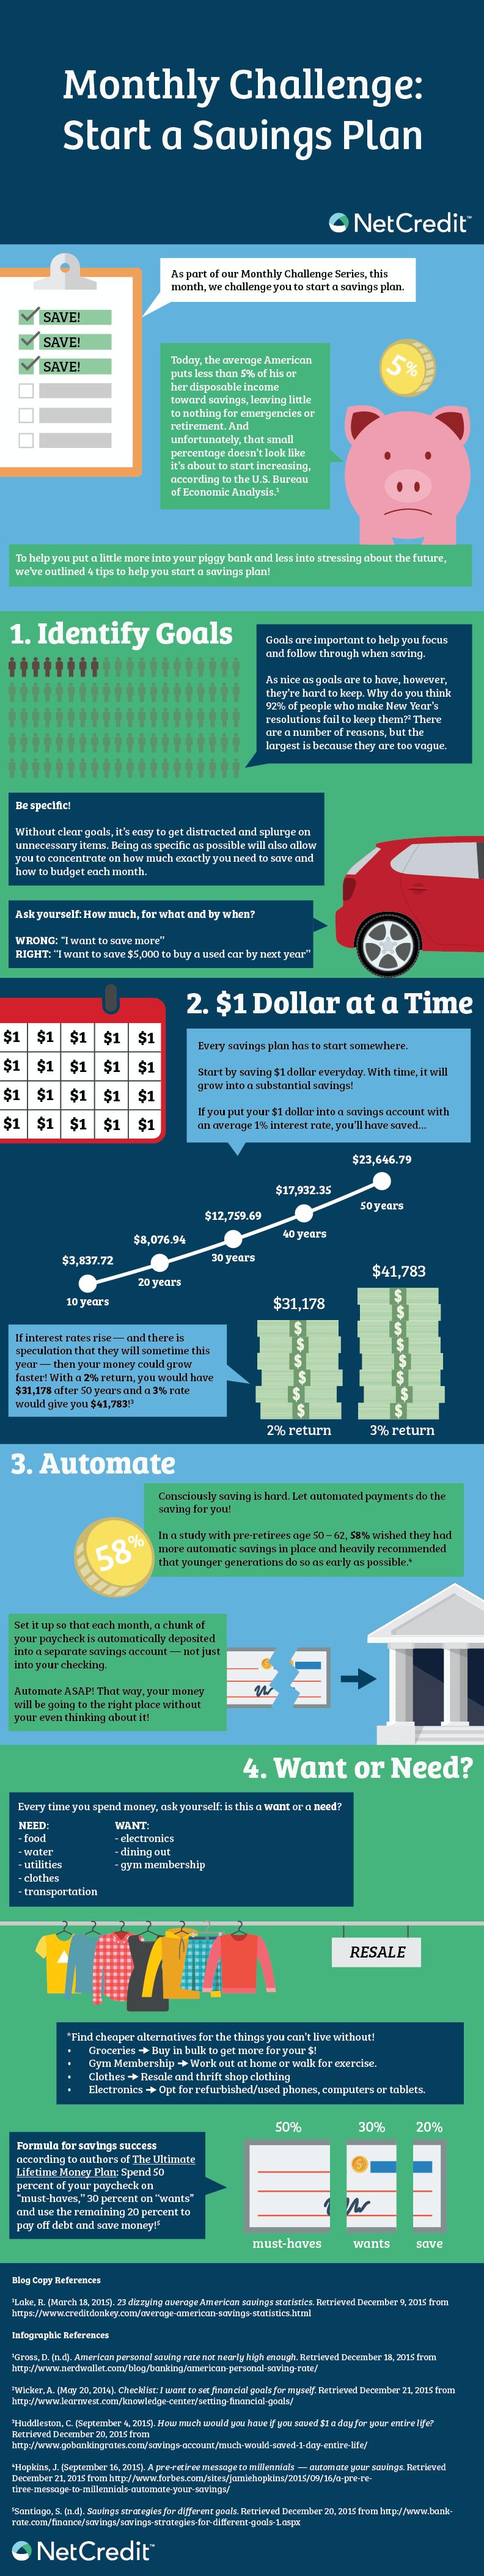 NC Monthly Challenge- Start a Savings Plan